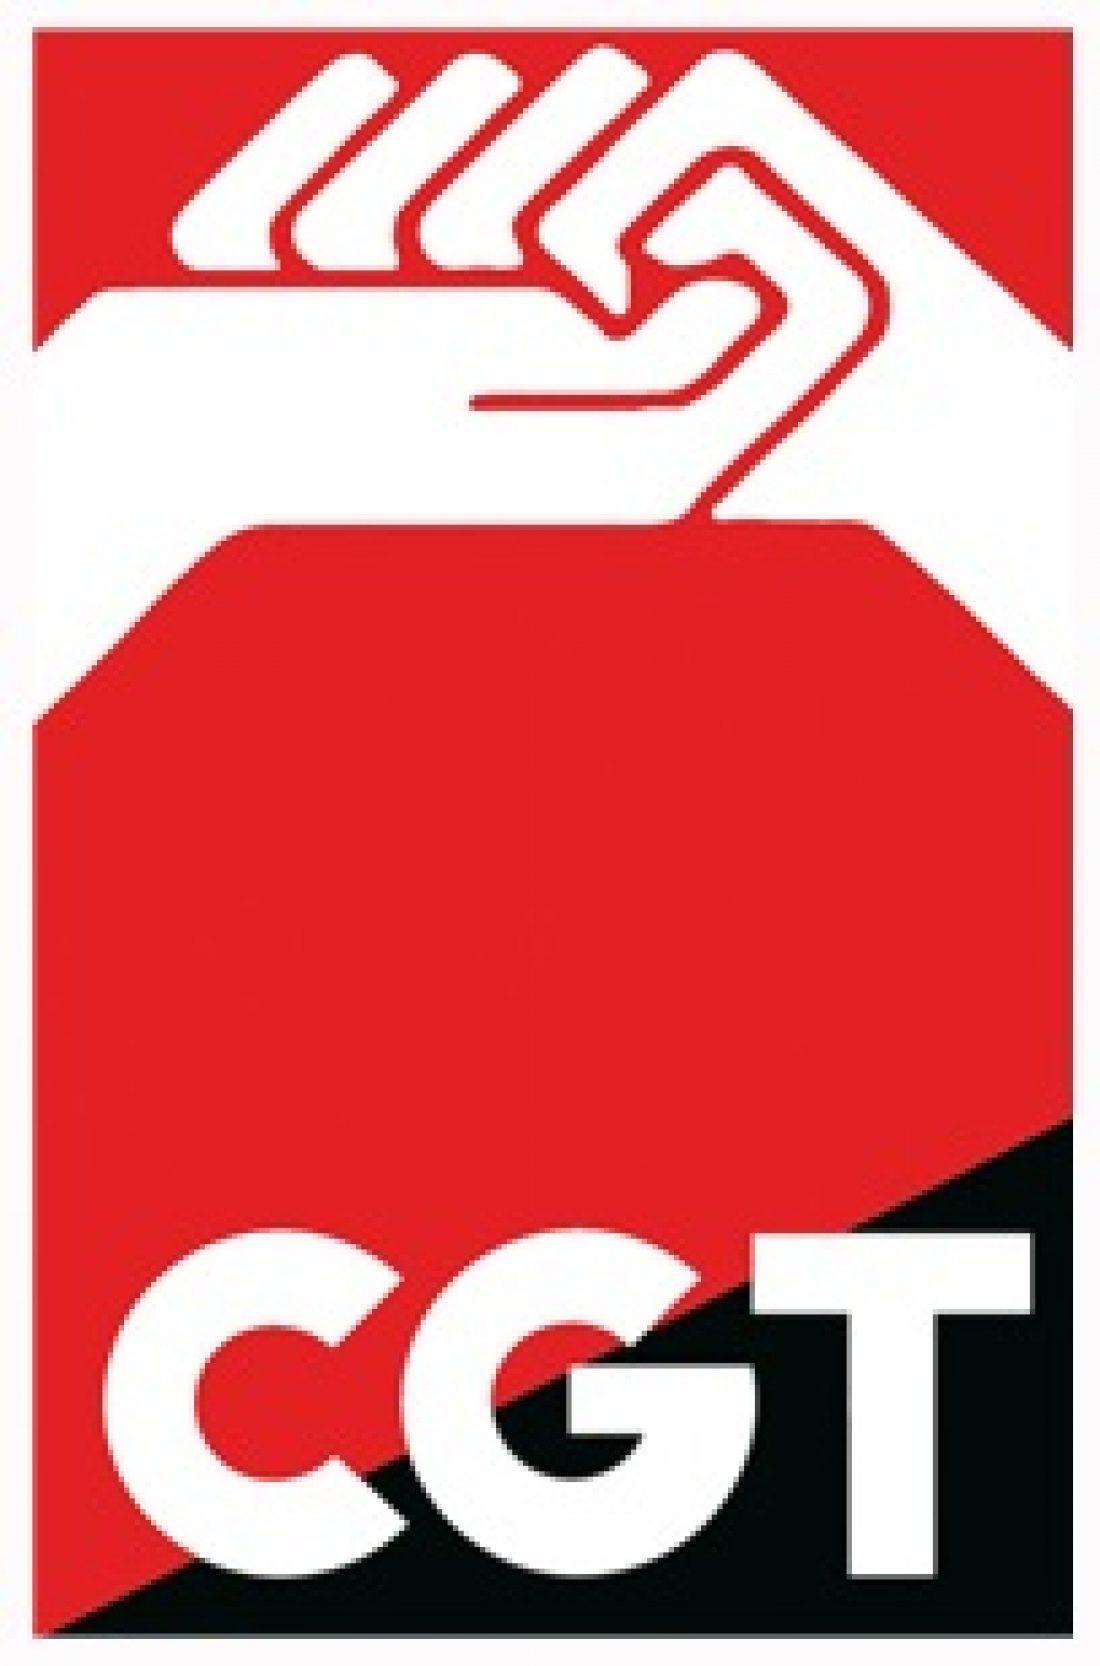 Comité Confederal CGT